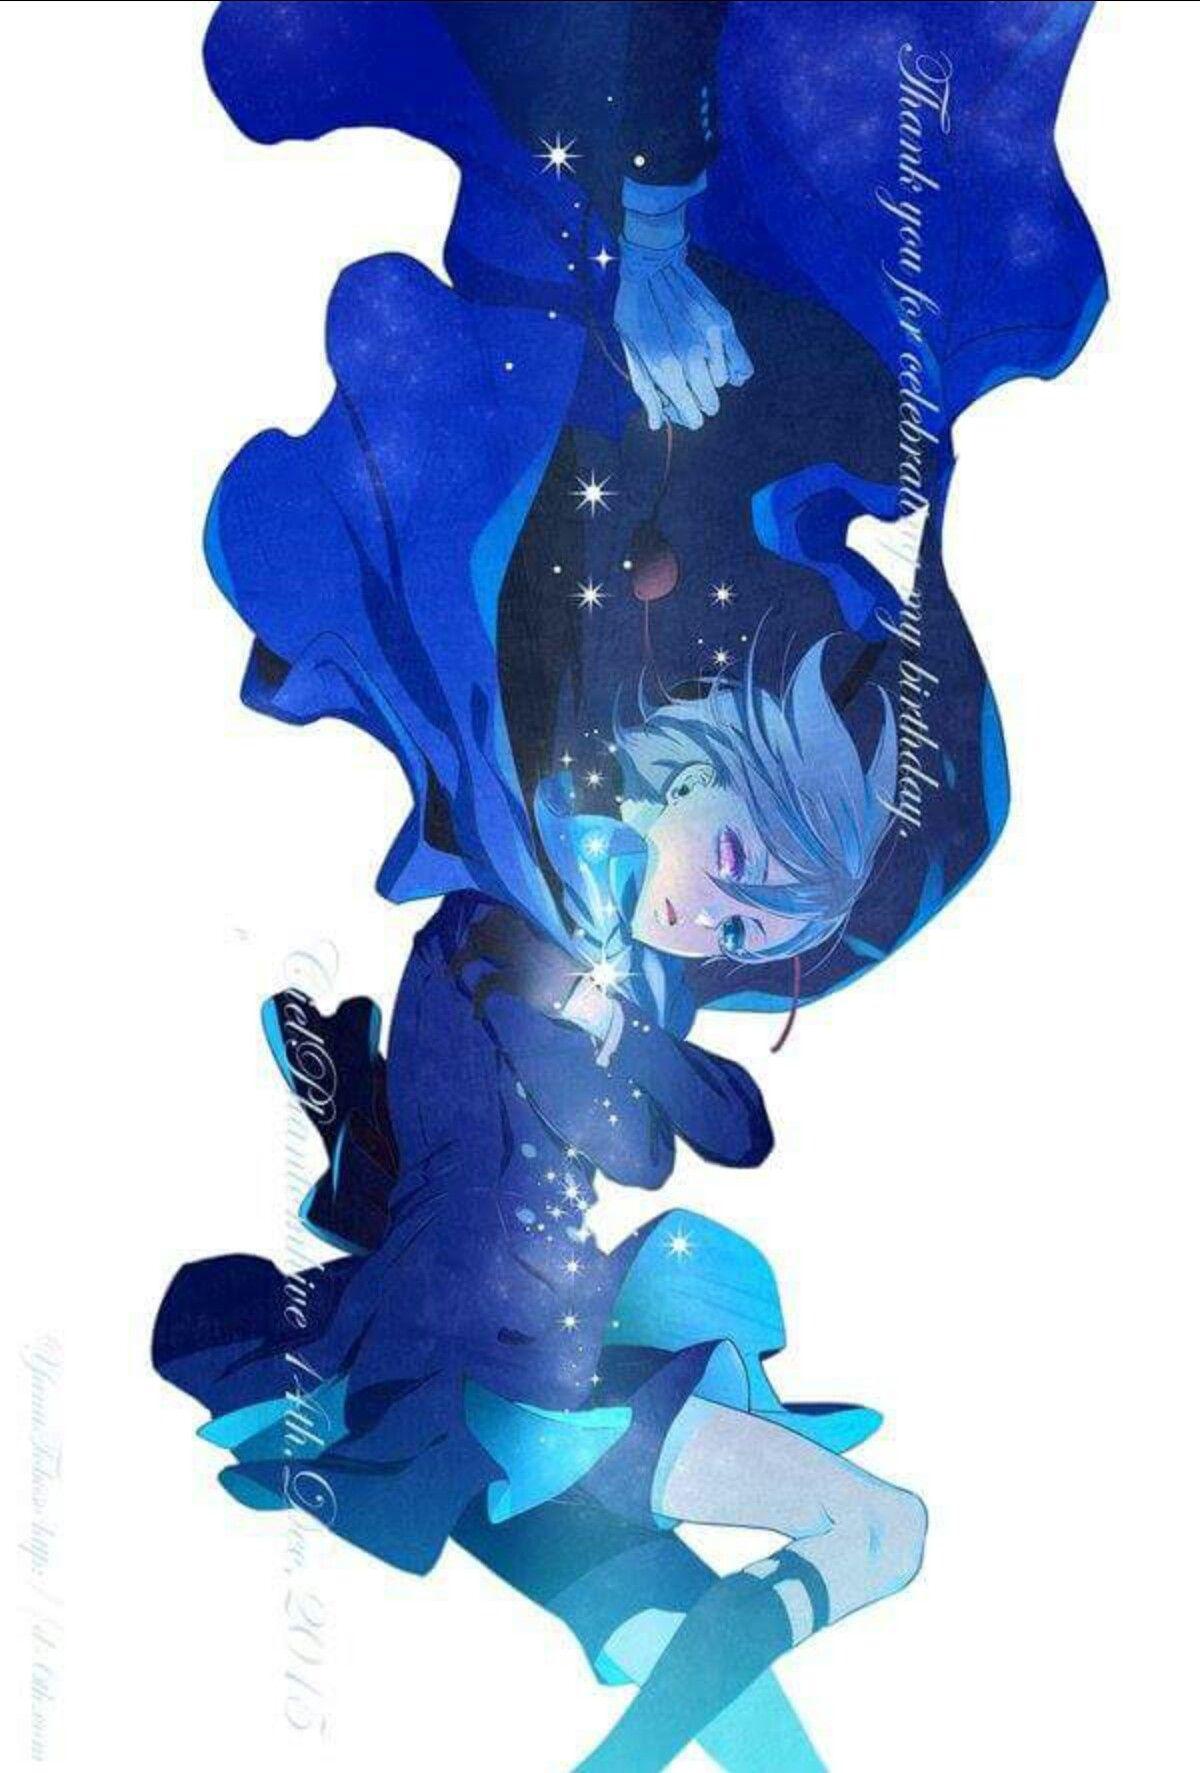 Black Butler/Kuroshitsuji Ciel Phantomhive